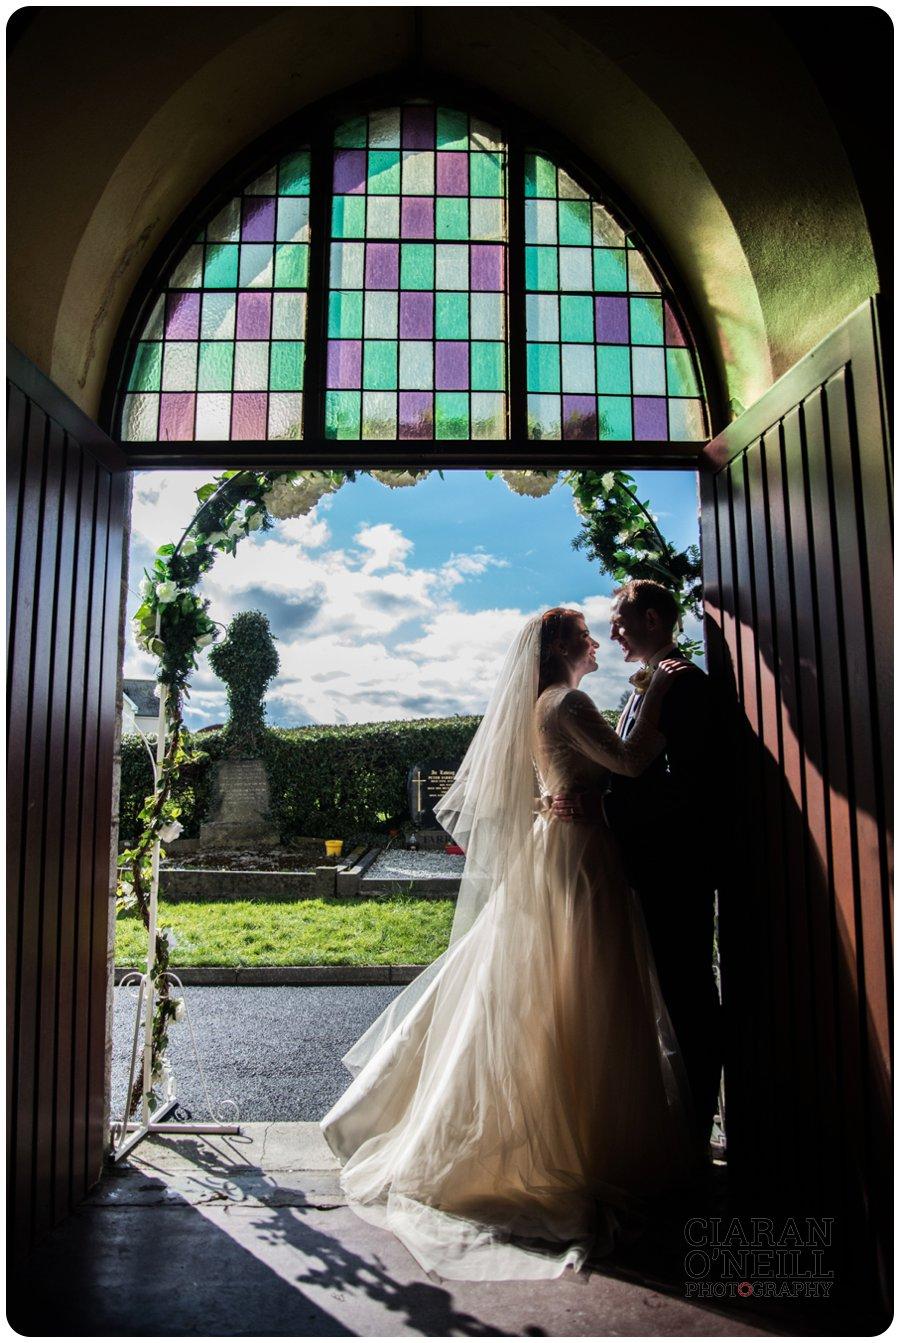 Gabrielle & Seán's wedding at Castle Leslie 20